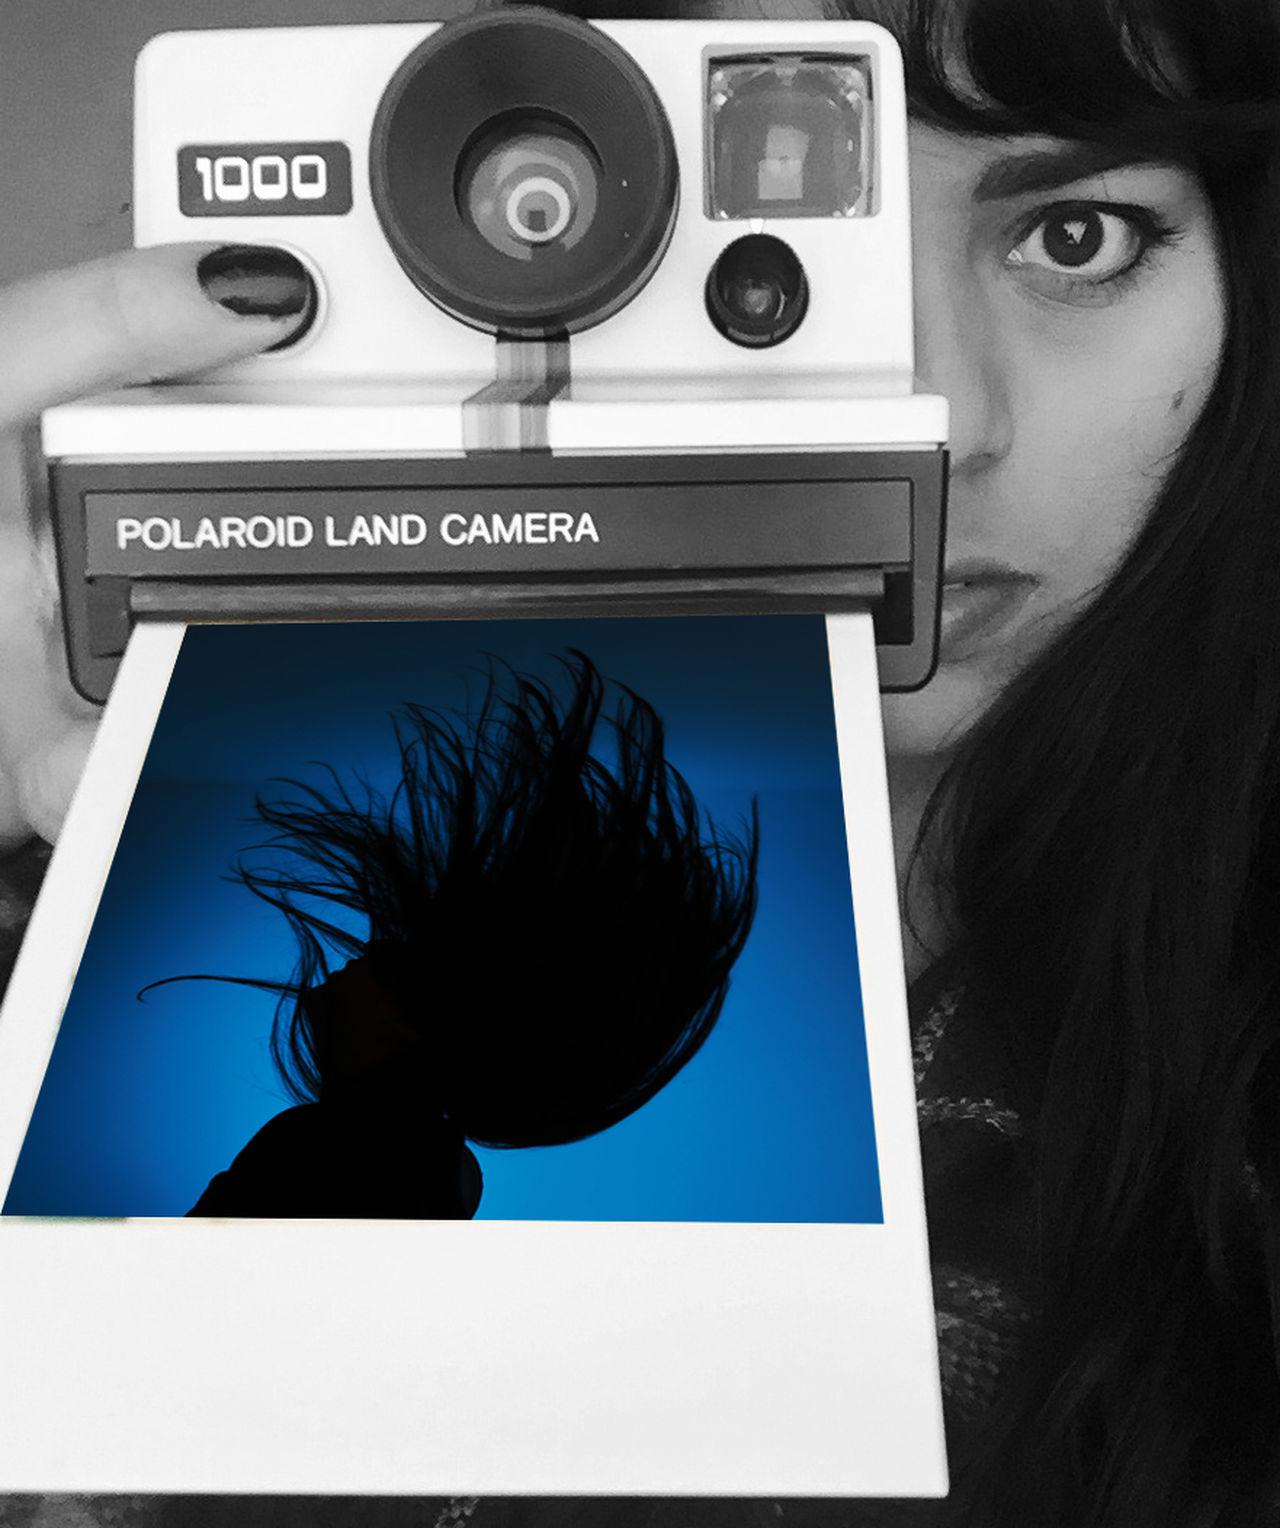 Self Portrait Creative Photography Polaroid Uniqueness Gel Lighting Double Exposure Photoshop Hair Movement Gel Lighting Gels